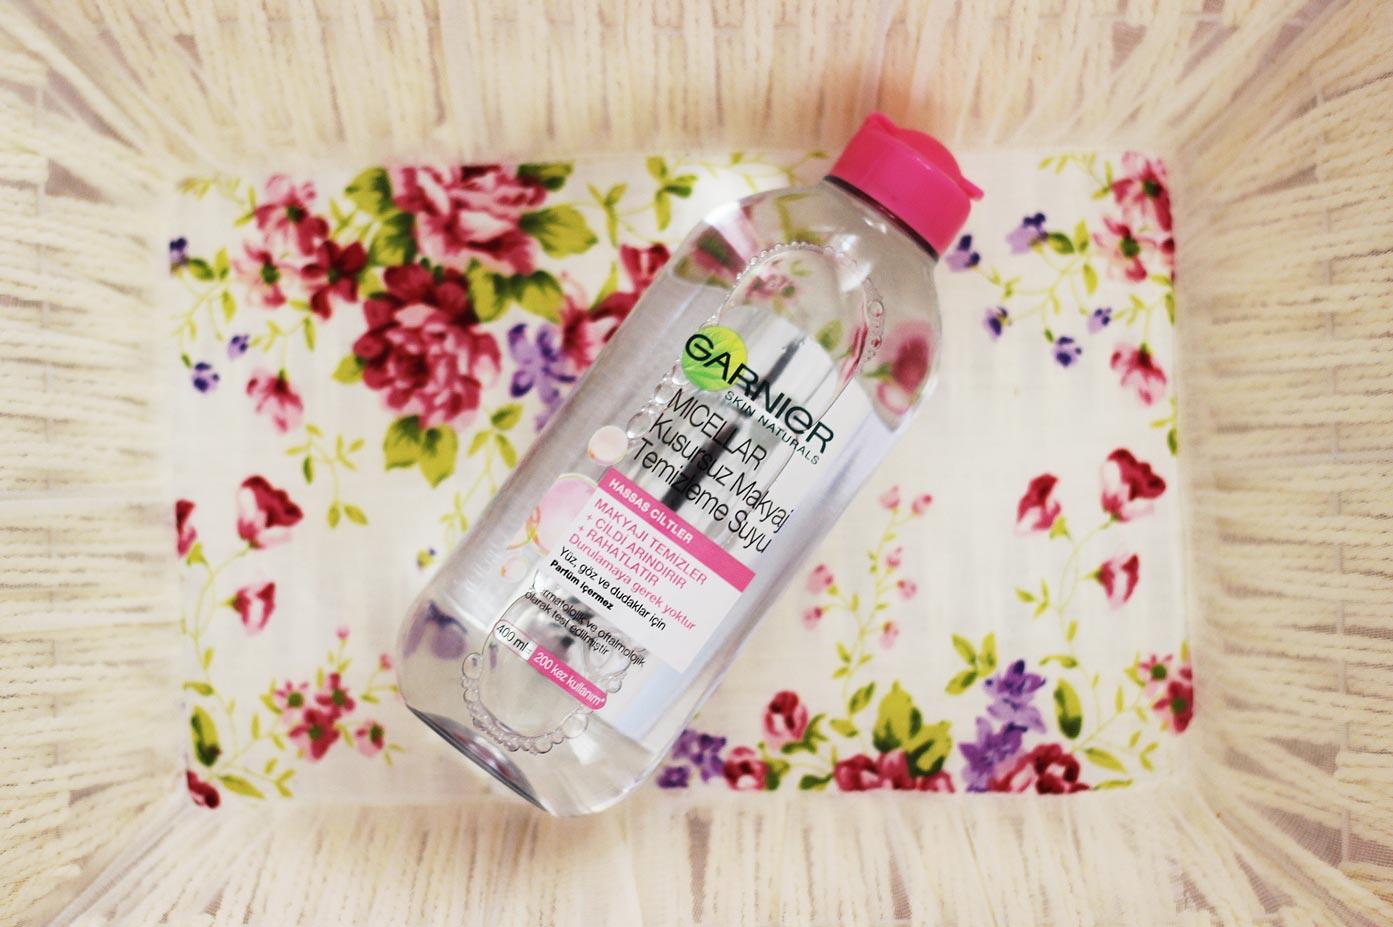 garnier-micellar-makyaj temizleme suyu